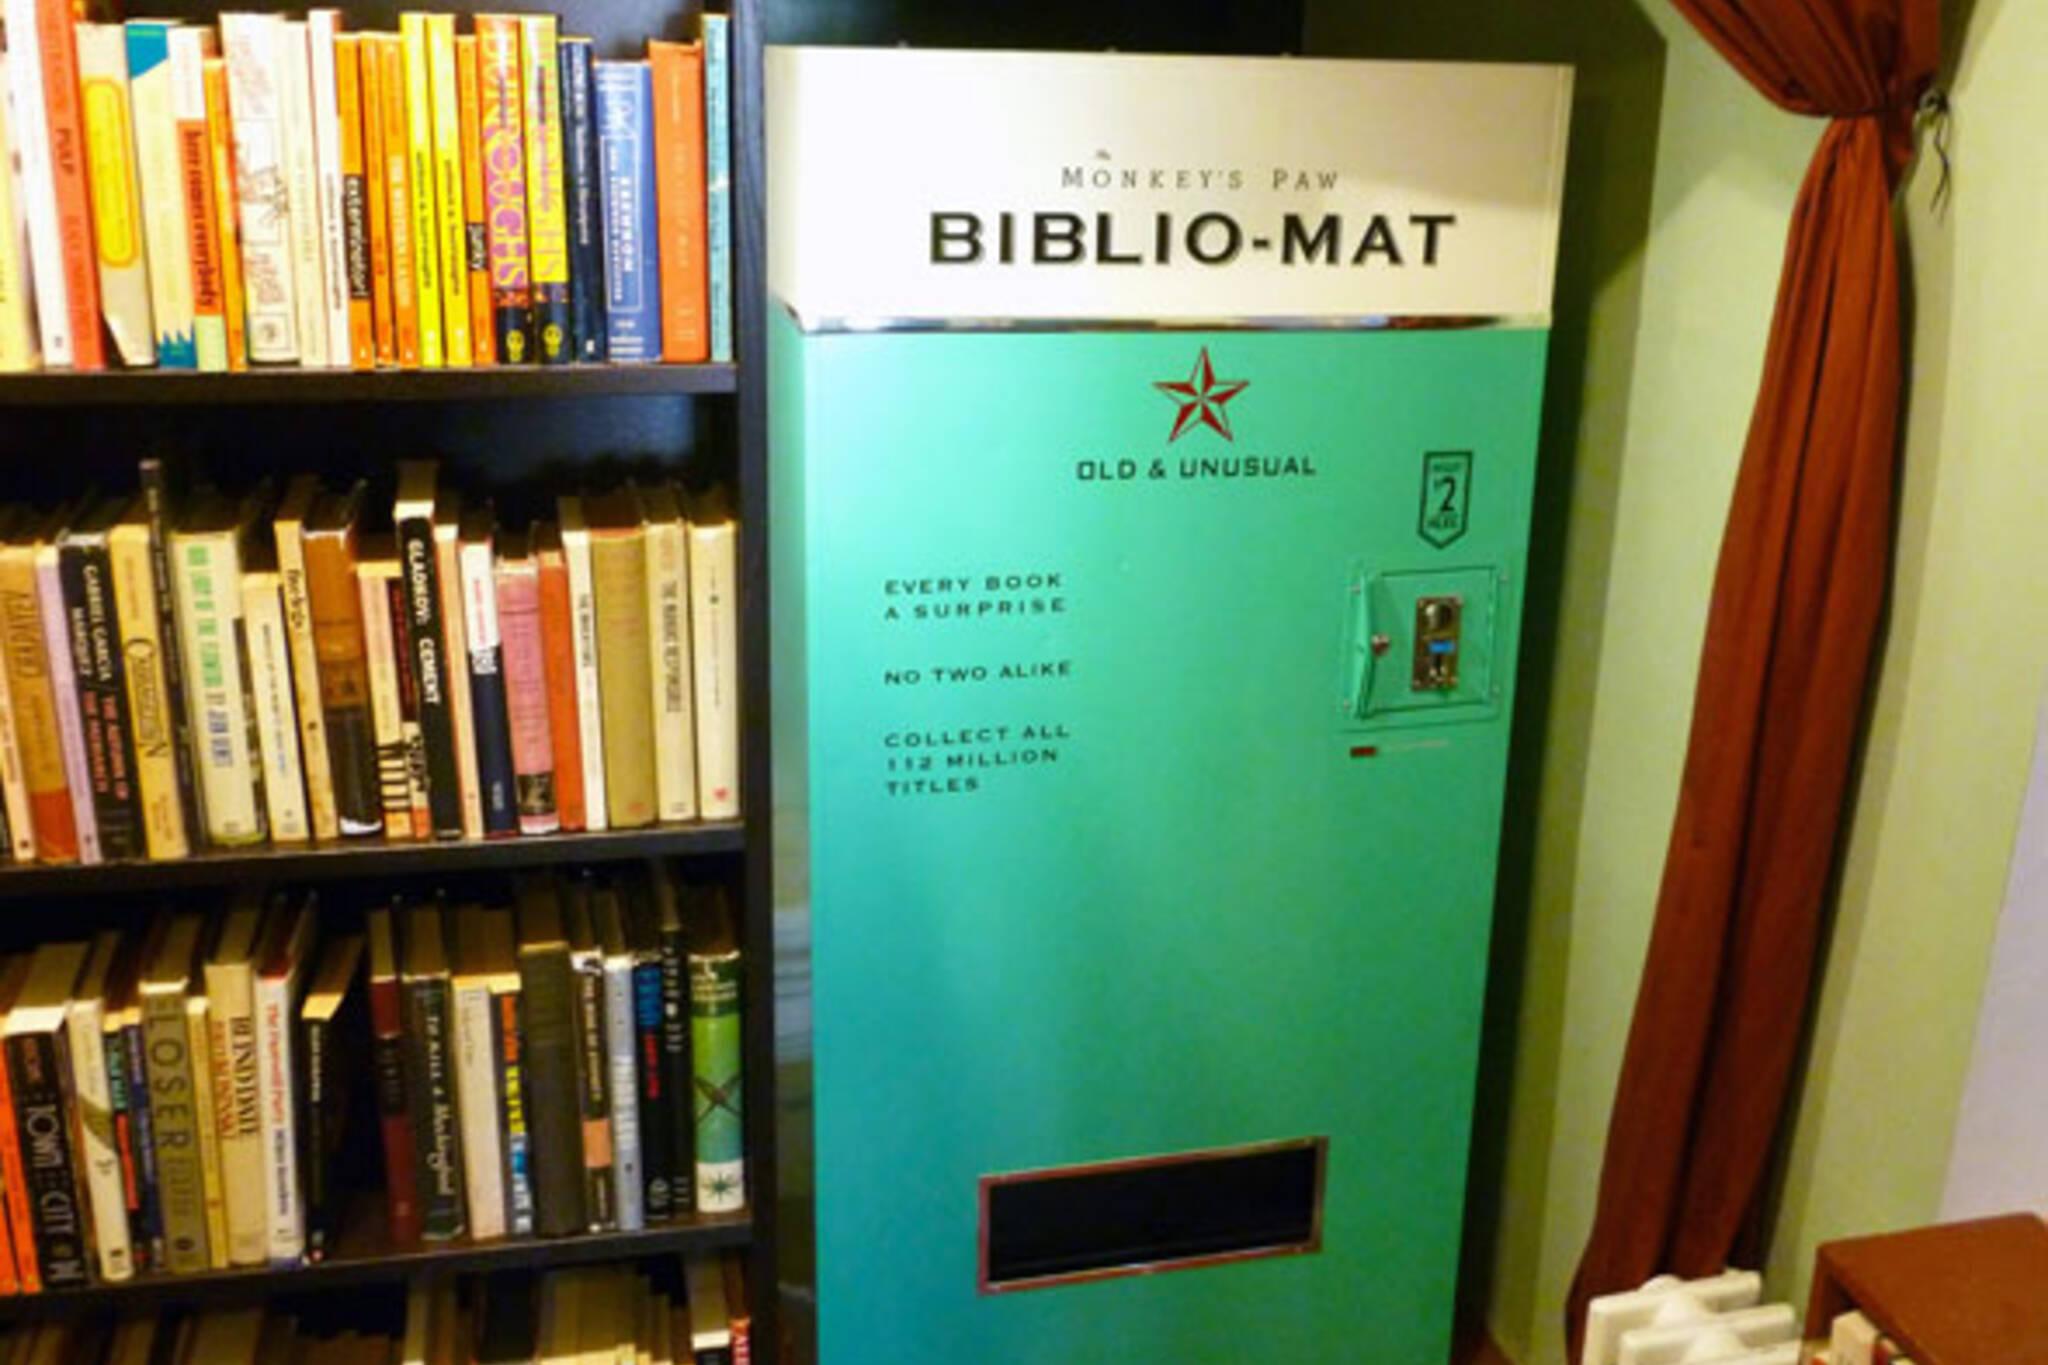 toronto monkey's paw book vending machine